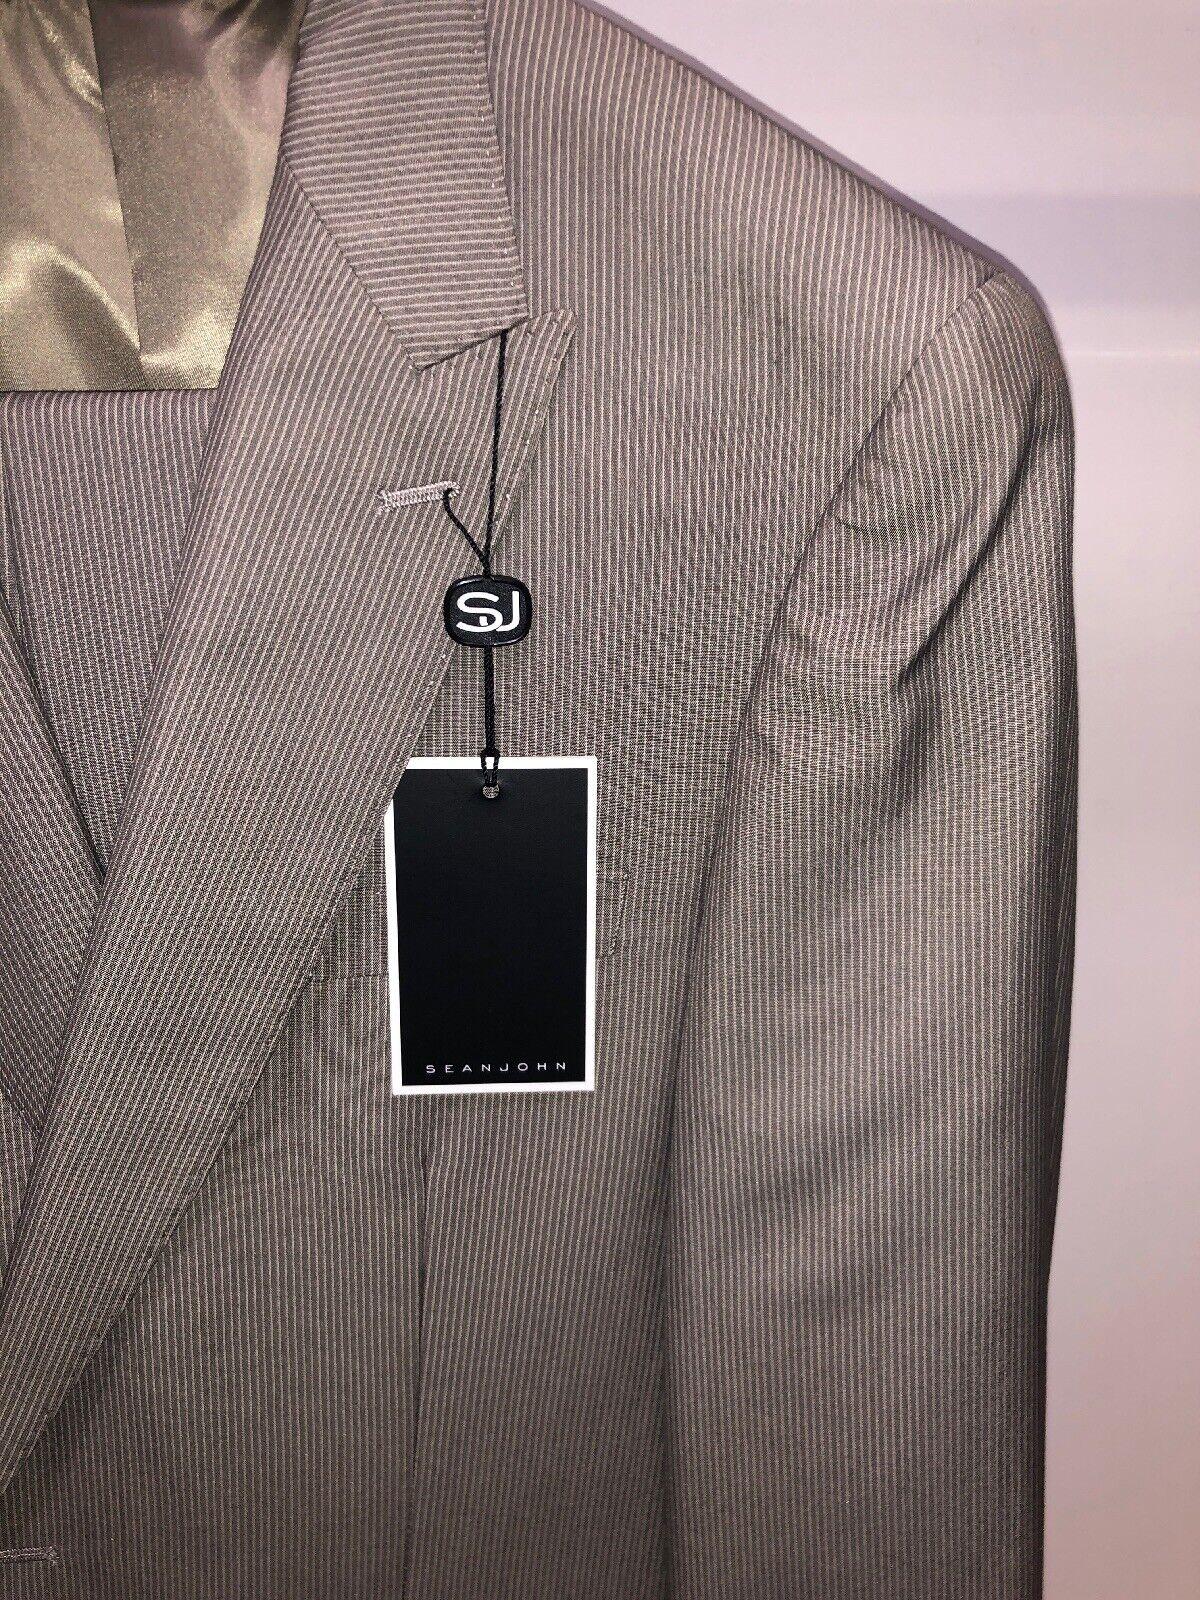 BNWT Sean John 44L Tan Beige Mode Pinstriped Premium Exotic Harvey Suit WOW